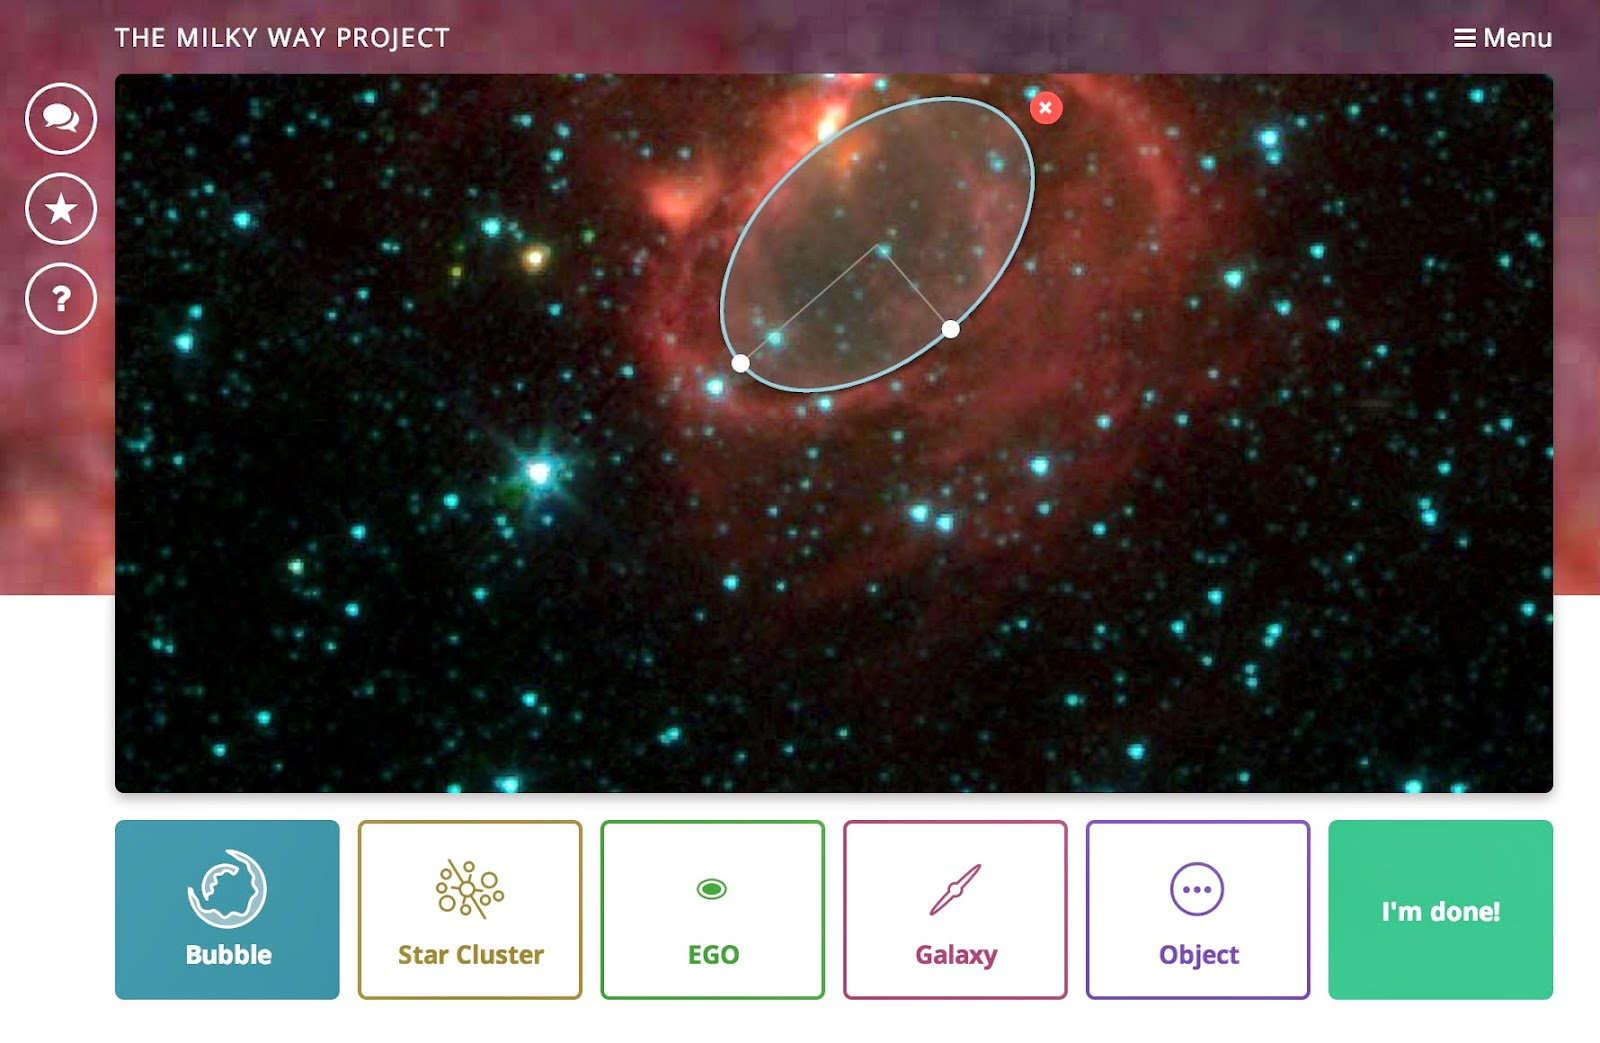 Umd astro 101 herrera camus ix hr diagram and nebulae the milky way project ccuart Choice Image